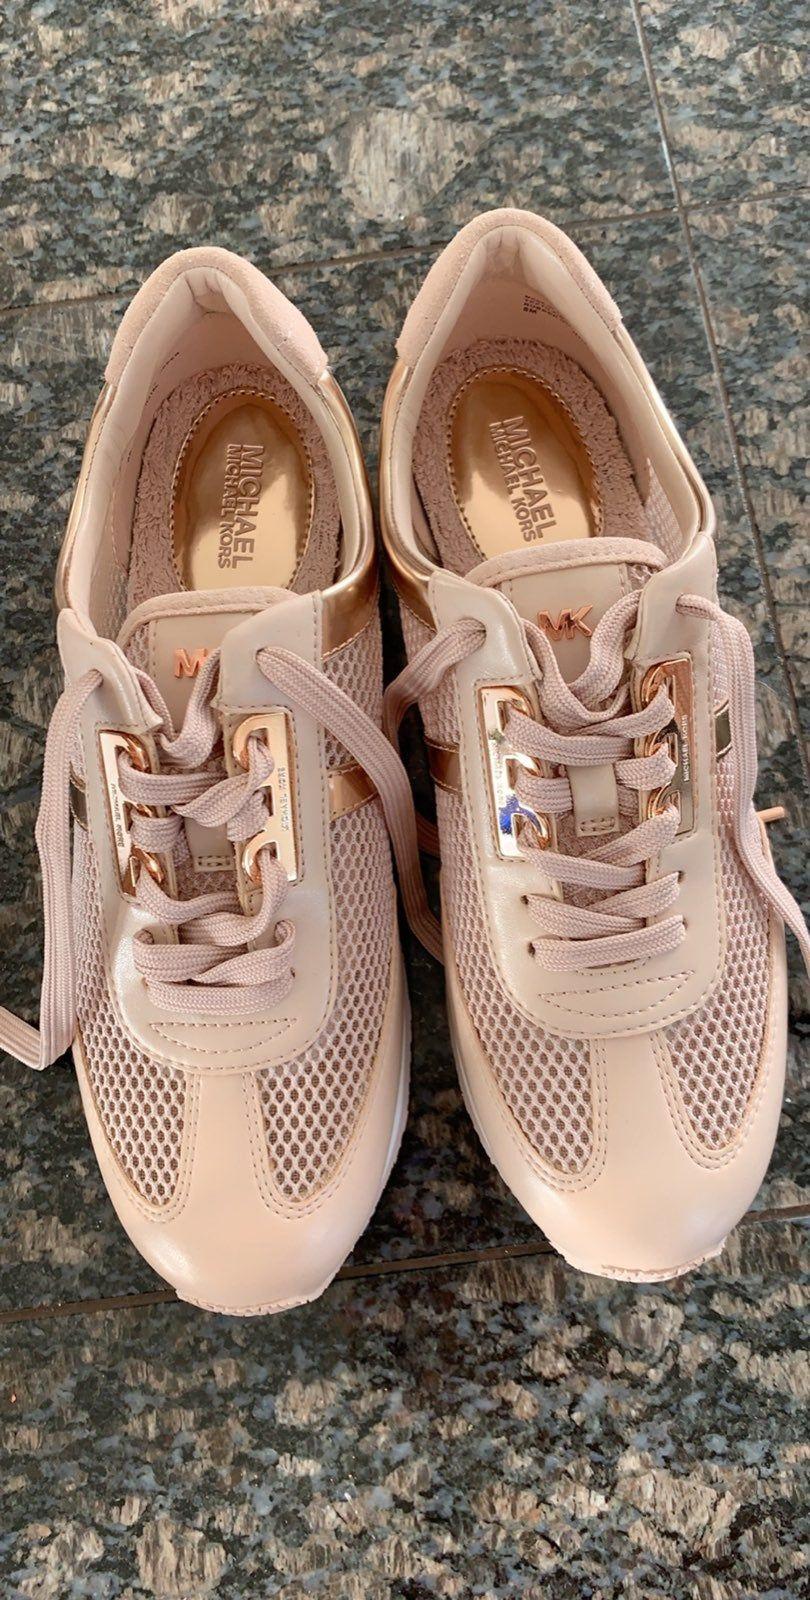 Muchas Kors rose gold Maggie sneakers